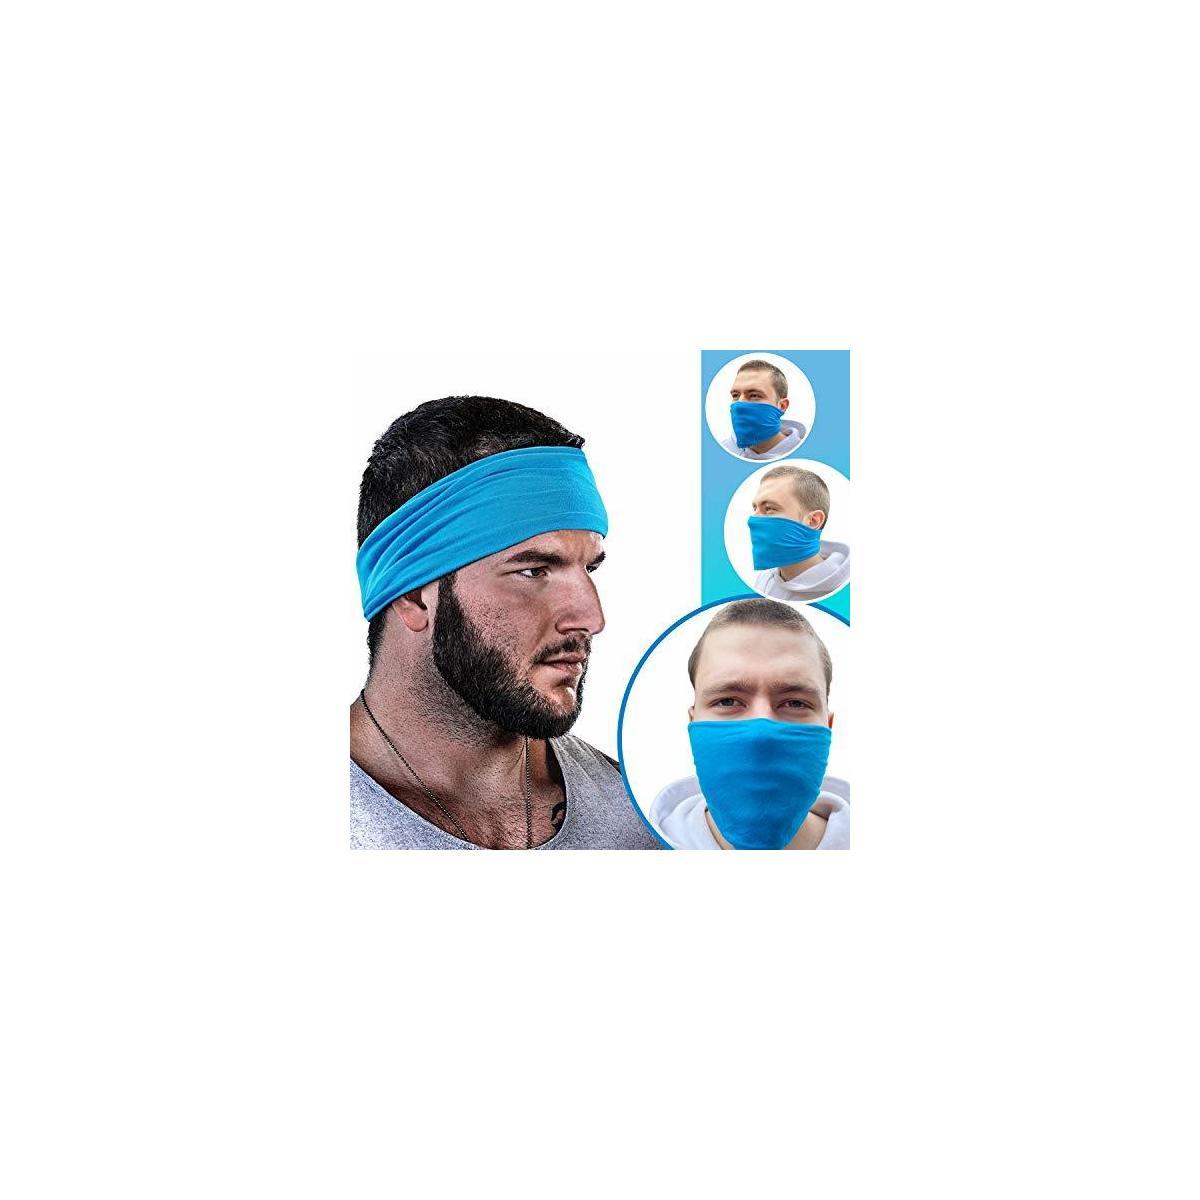 GearTOP Mens Headband Guys Sweatband | Face Mask | Ultimate Moisture Wicking Multi-Purpose Headbands